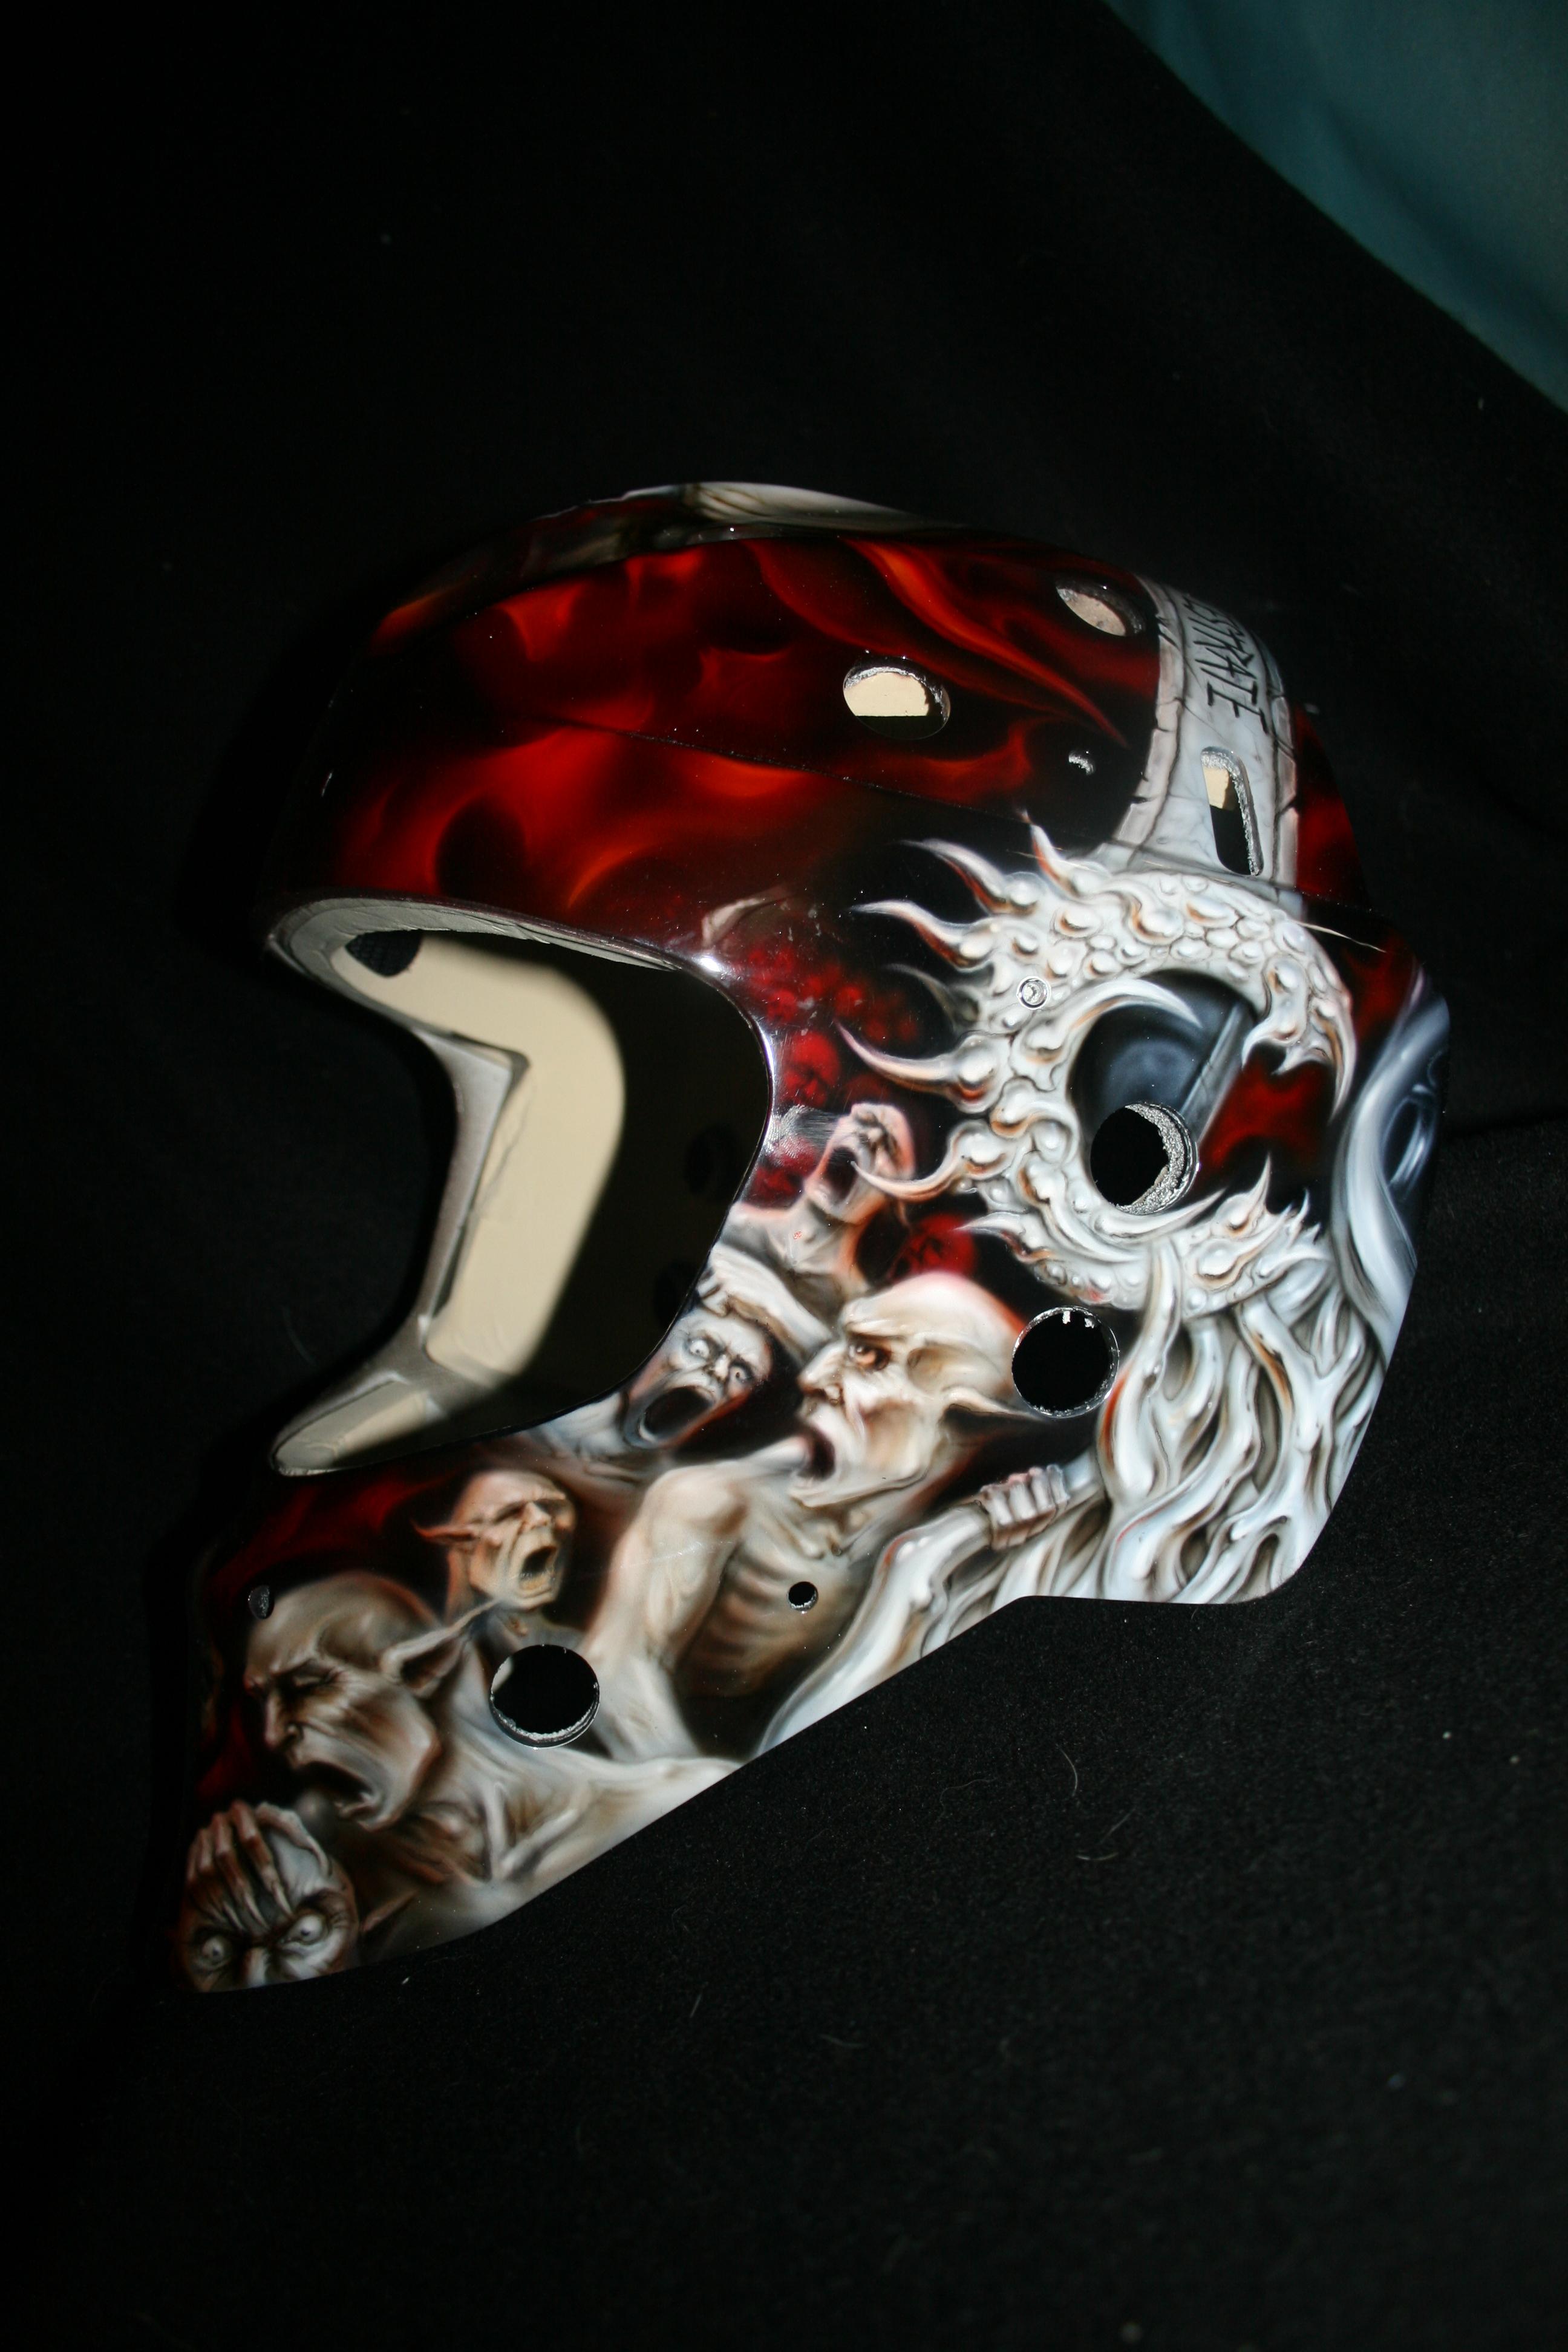 Curtis McElhinney Calgary Flames 02